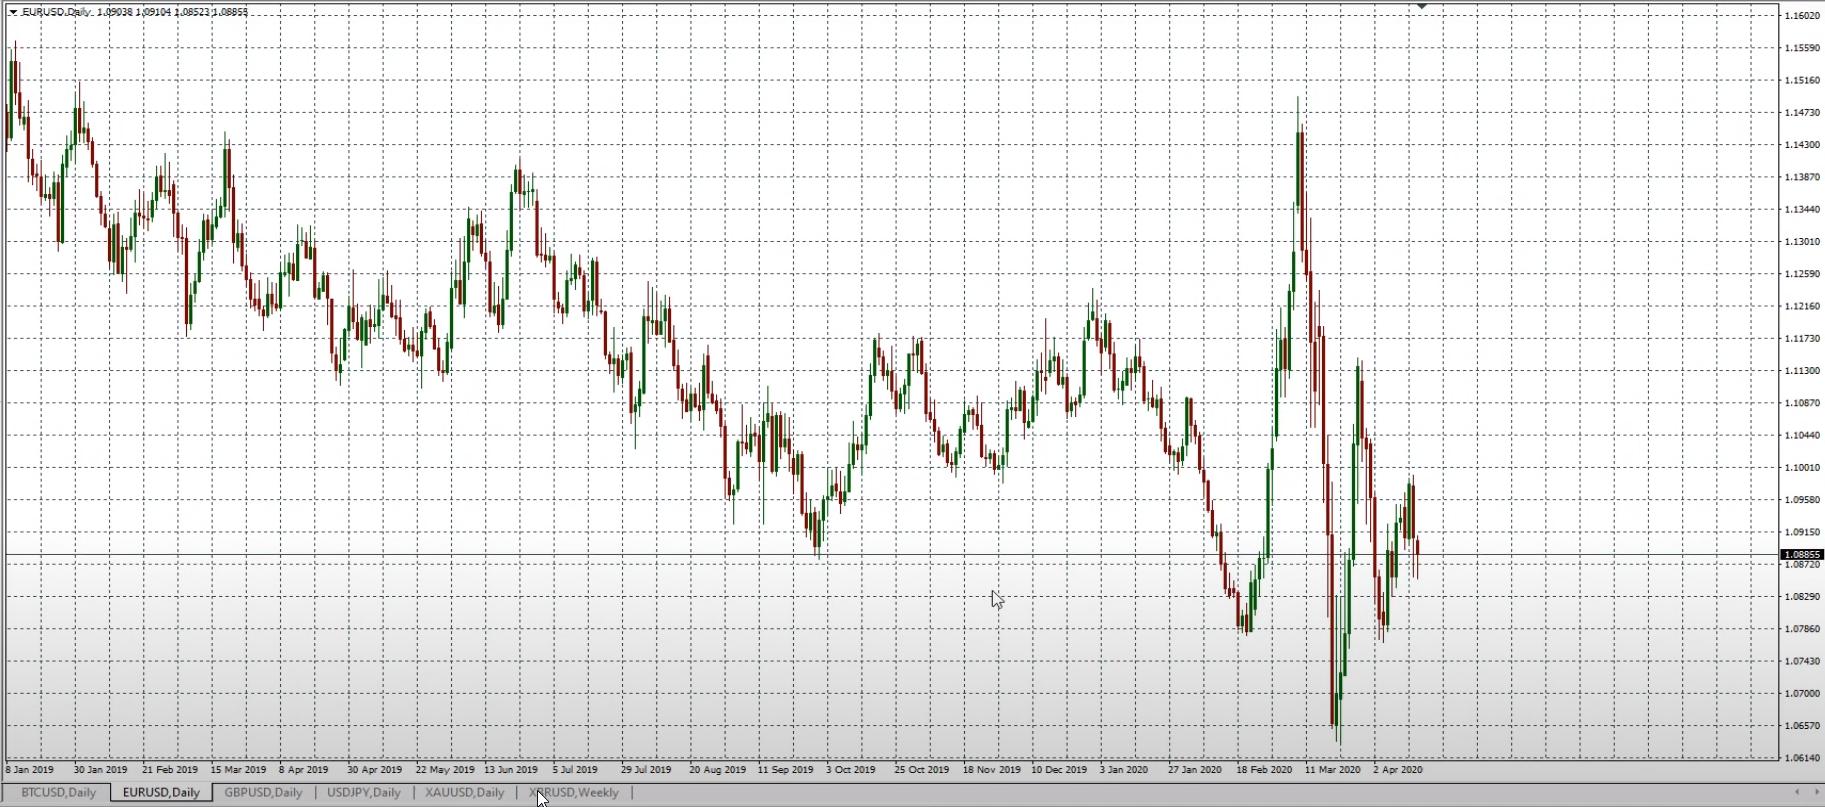 курс евро прогноз на май